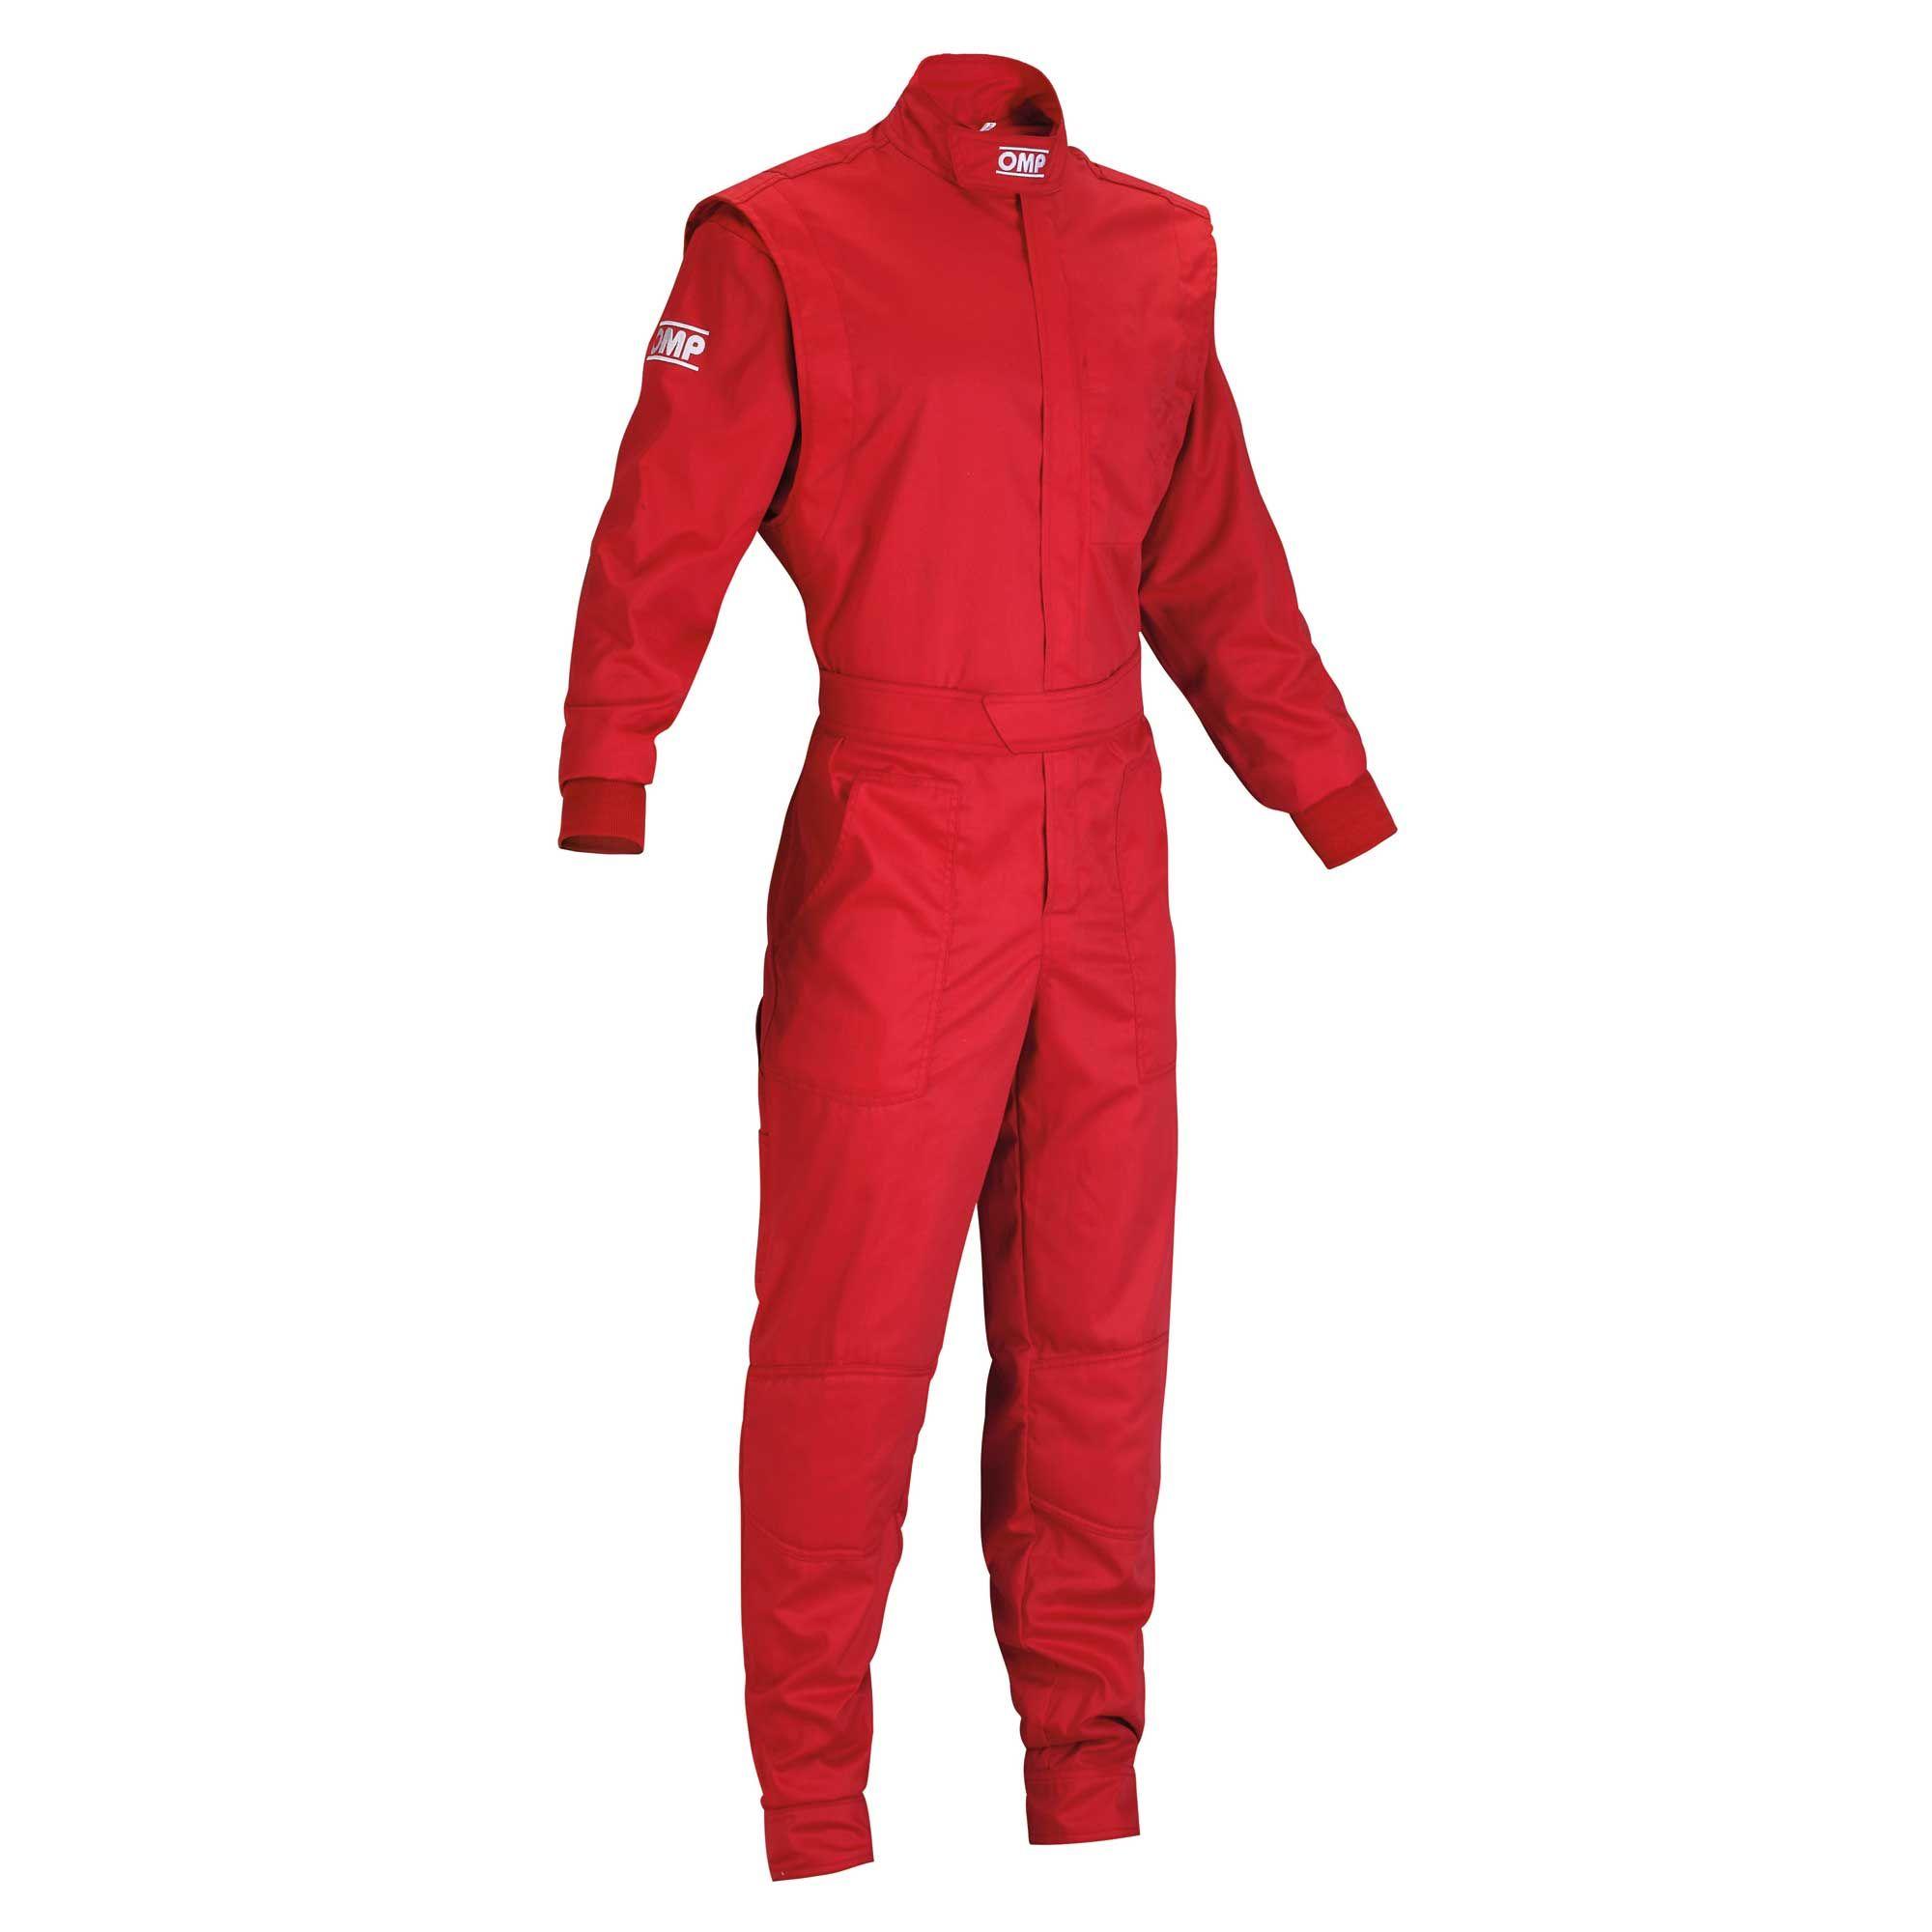 f786581e3 OMP Summer Mechanics Overalls | ropa de trabajo in 2019 | Mechanic ...